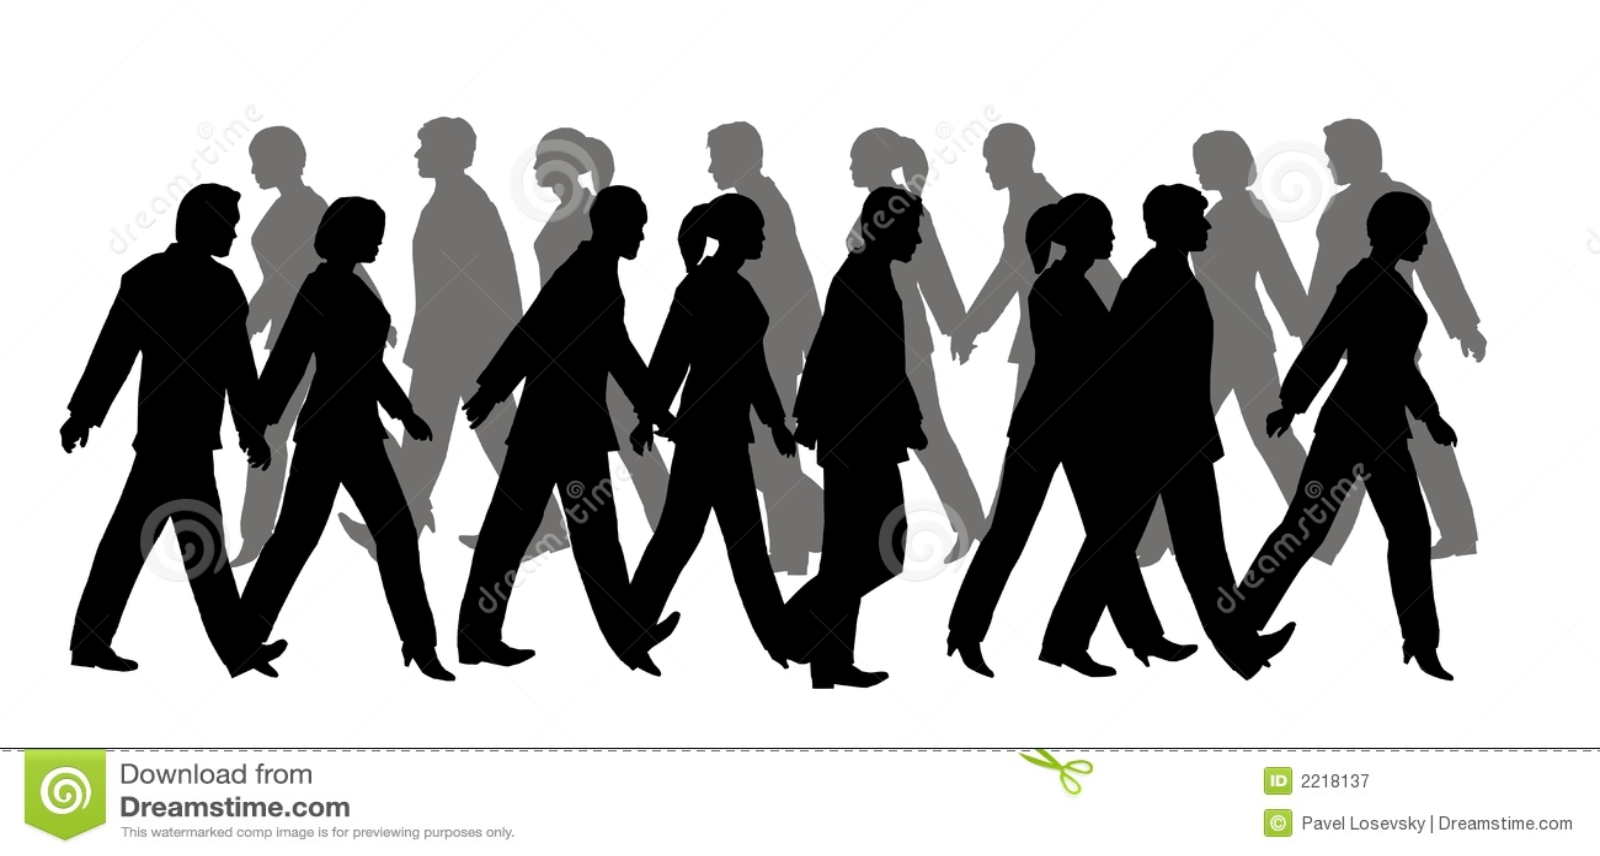 pedestrian silhouette royalty free stock photography No Pedestrian Clip Art Pedestrian Safety Clip Art